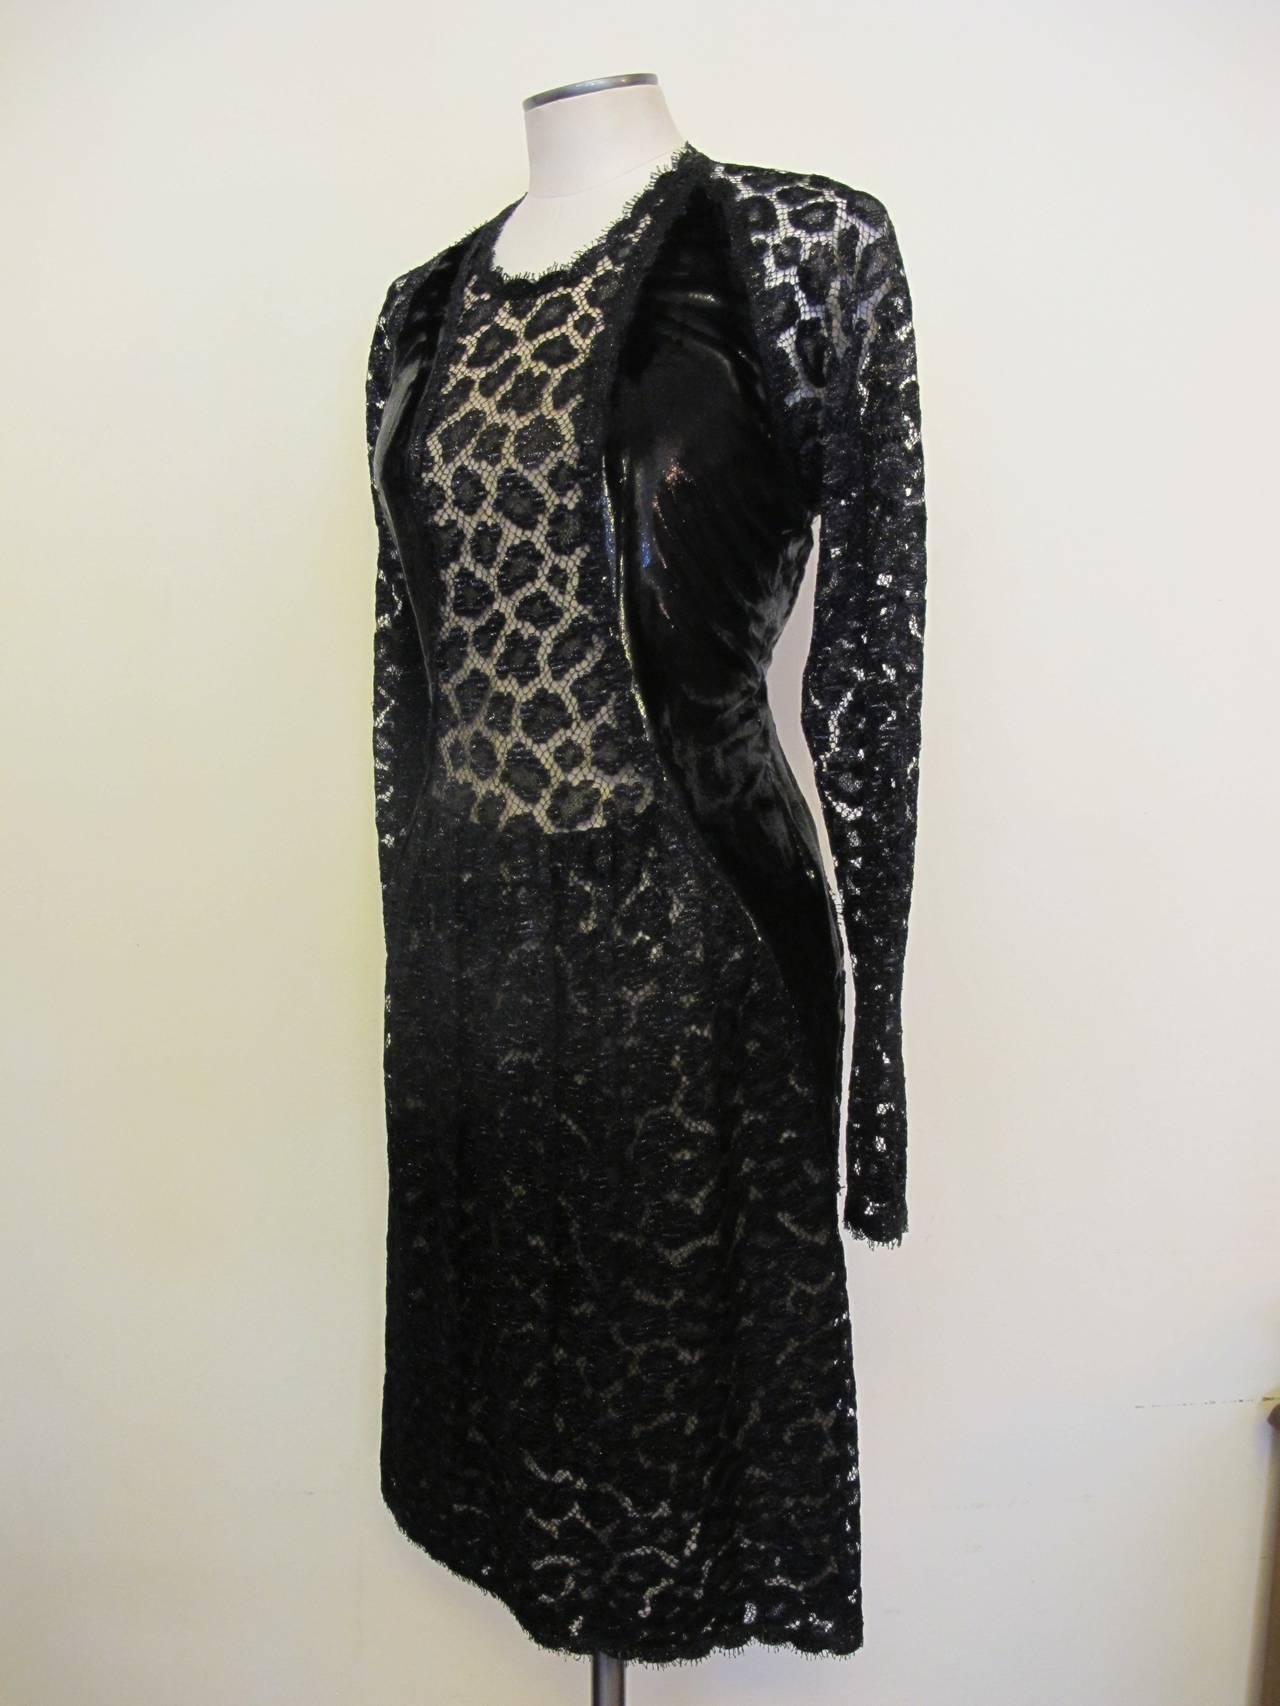 Geoffrey Beene Black Lace Cocktail Dress with Leopard Design 3